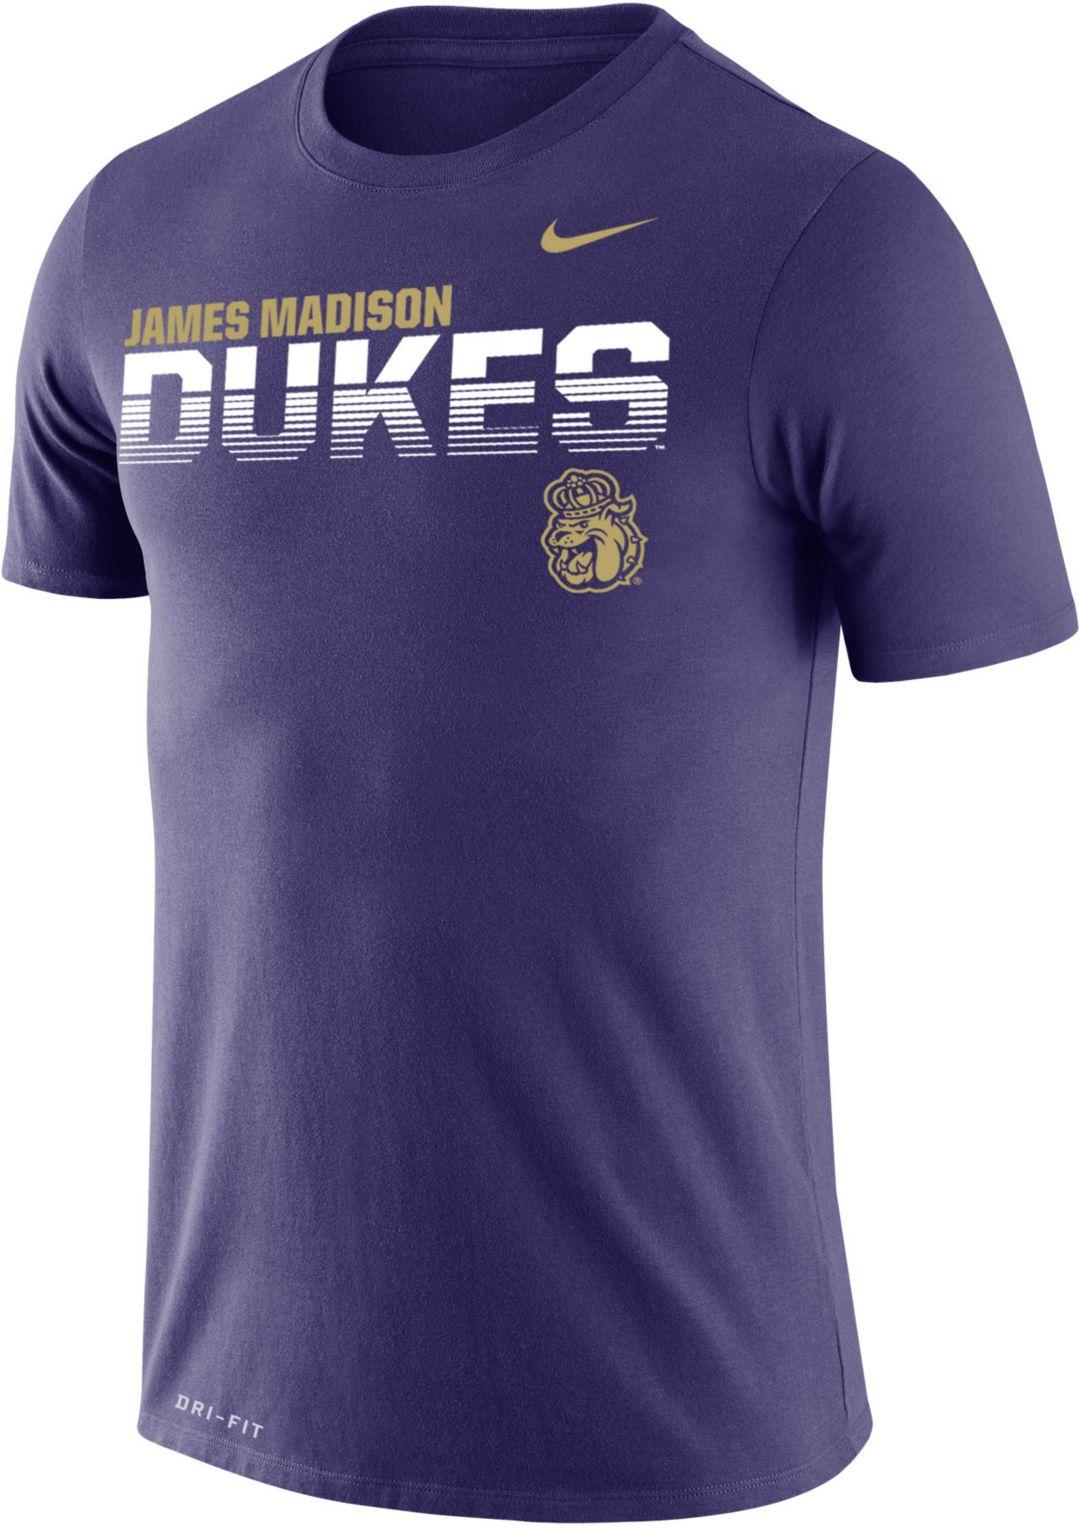 online store 7c4d0 ffed2 Nike Men's James Madison Dukes Purple Legend Football Sideline T-Shirt